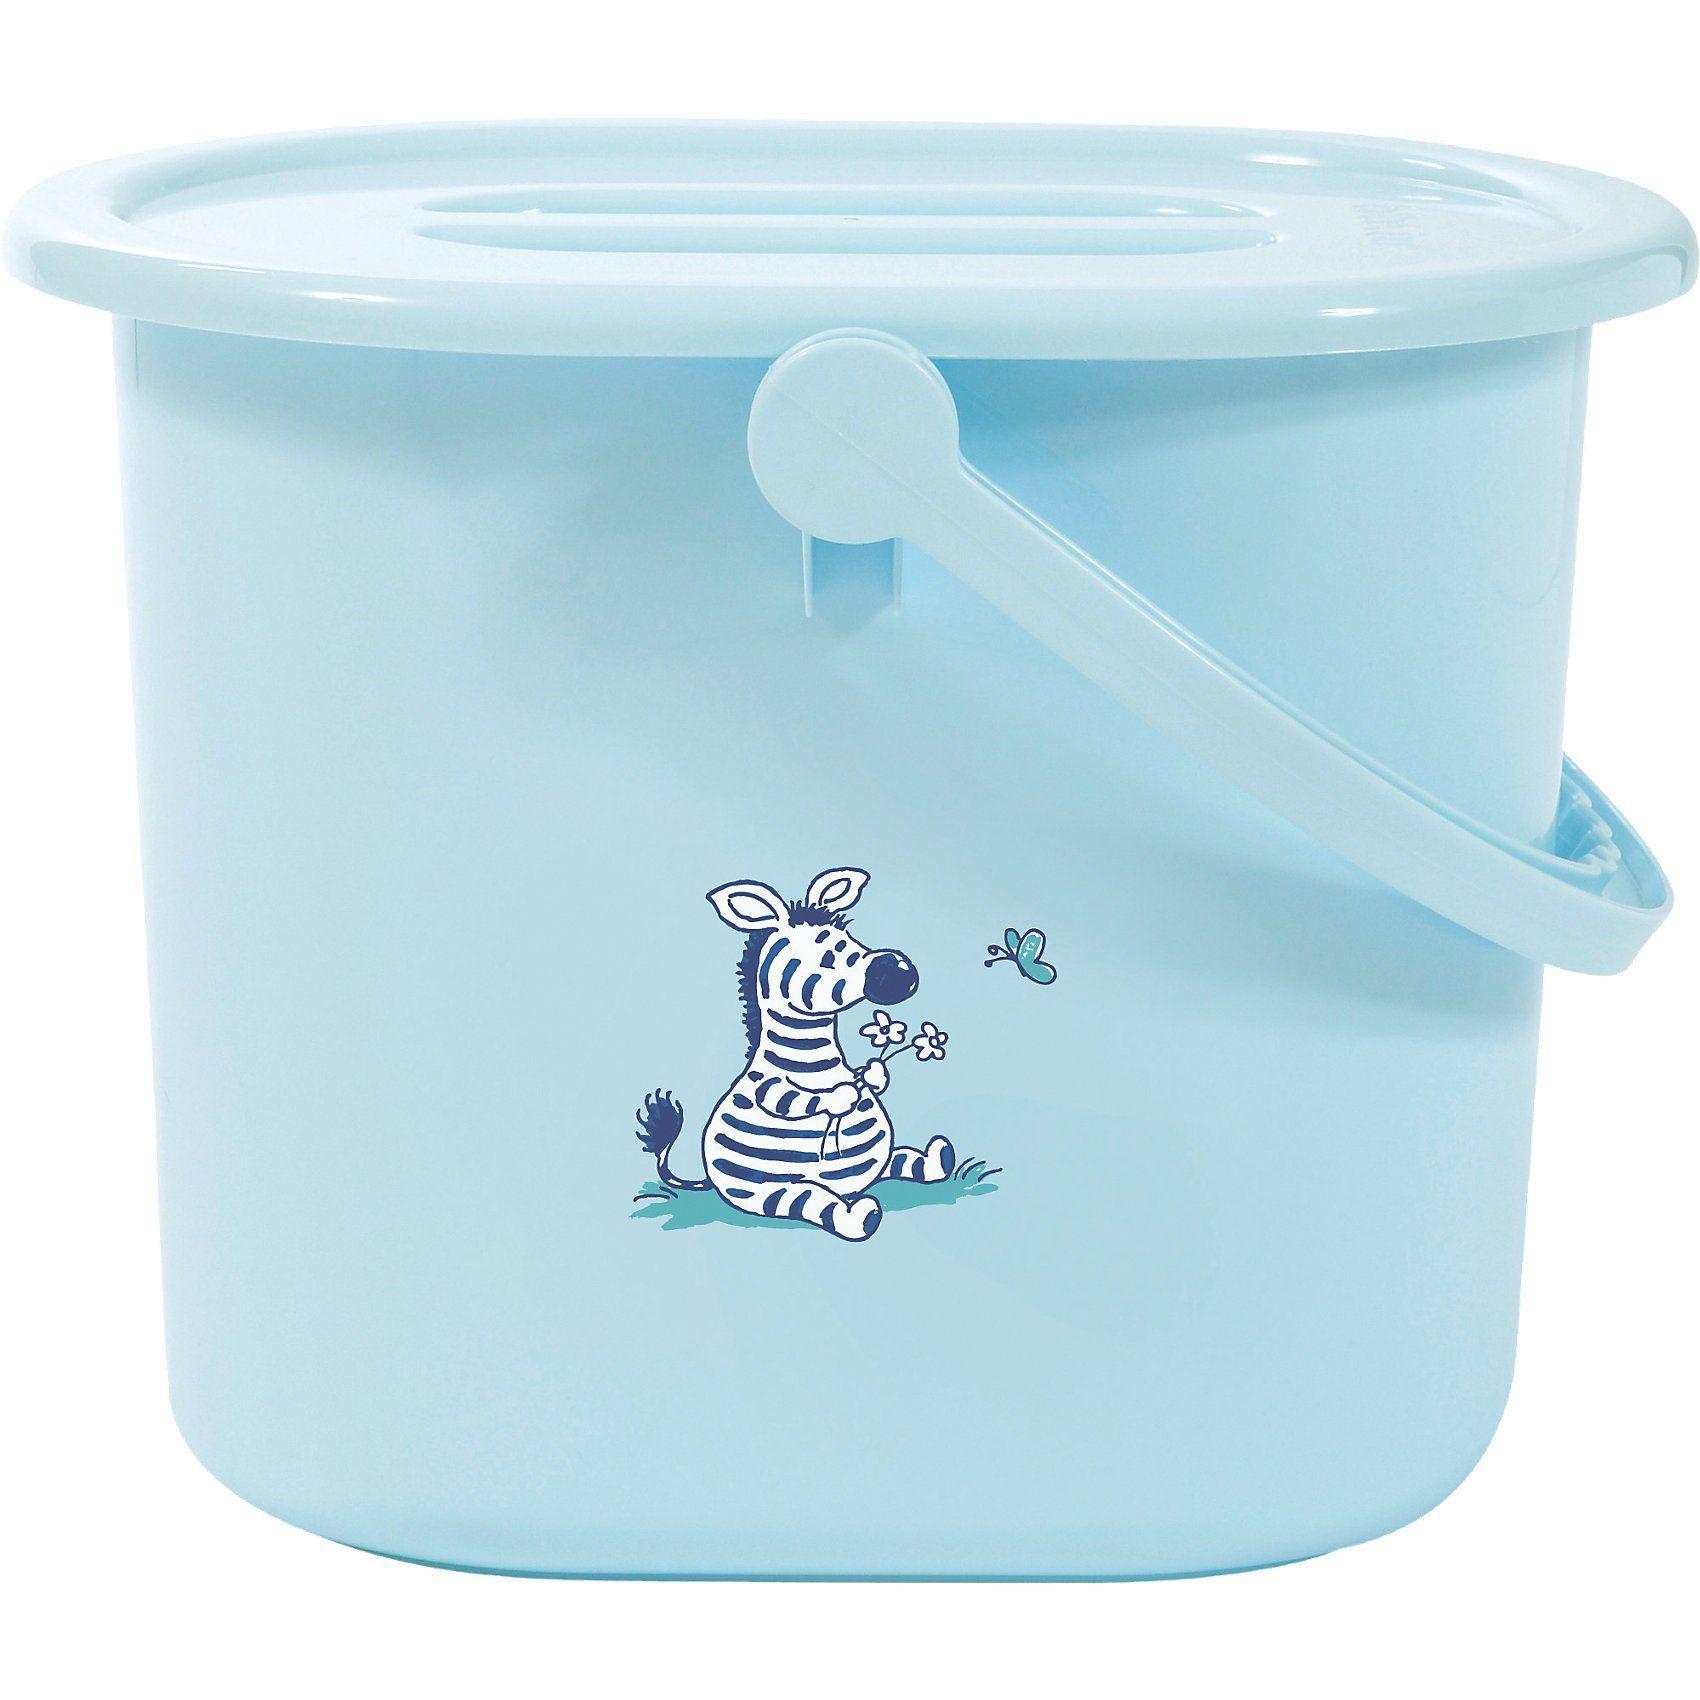 bébé-jou Windeleimer Dinky World, blau